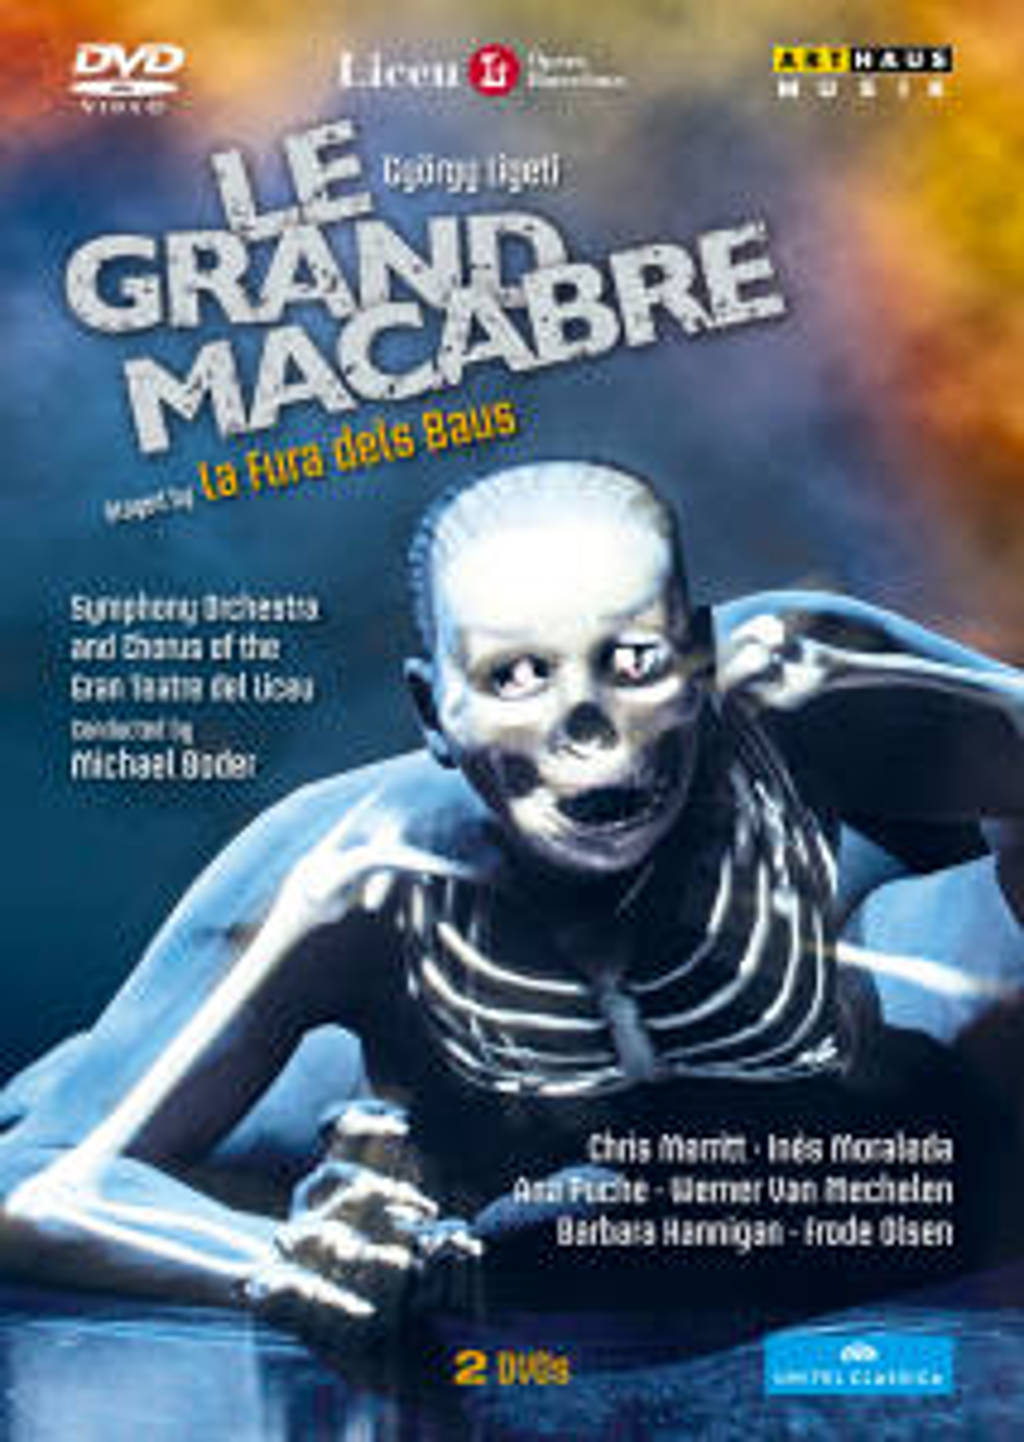 Merritt,Moraleda,Puche,Mechelen - Le Grand Macabre, Barcelone 2011 (DVD)